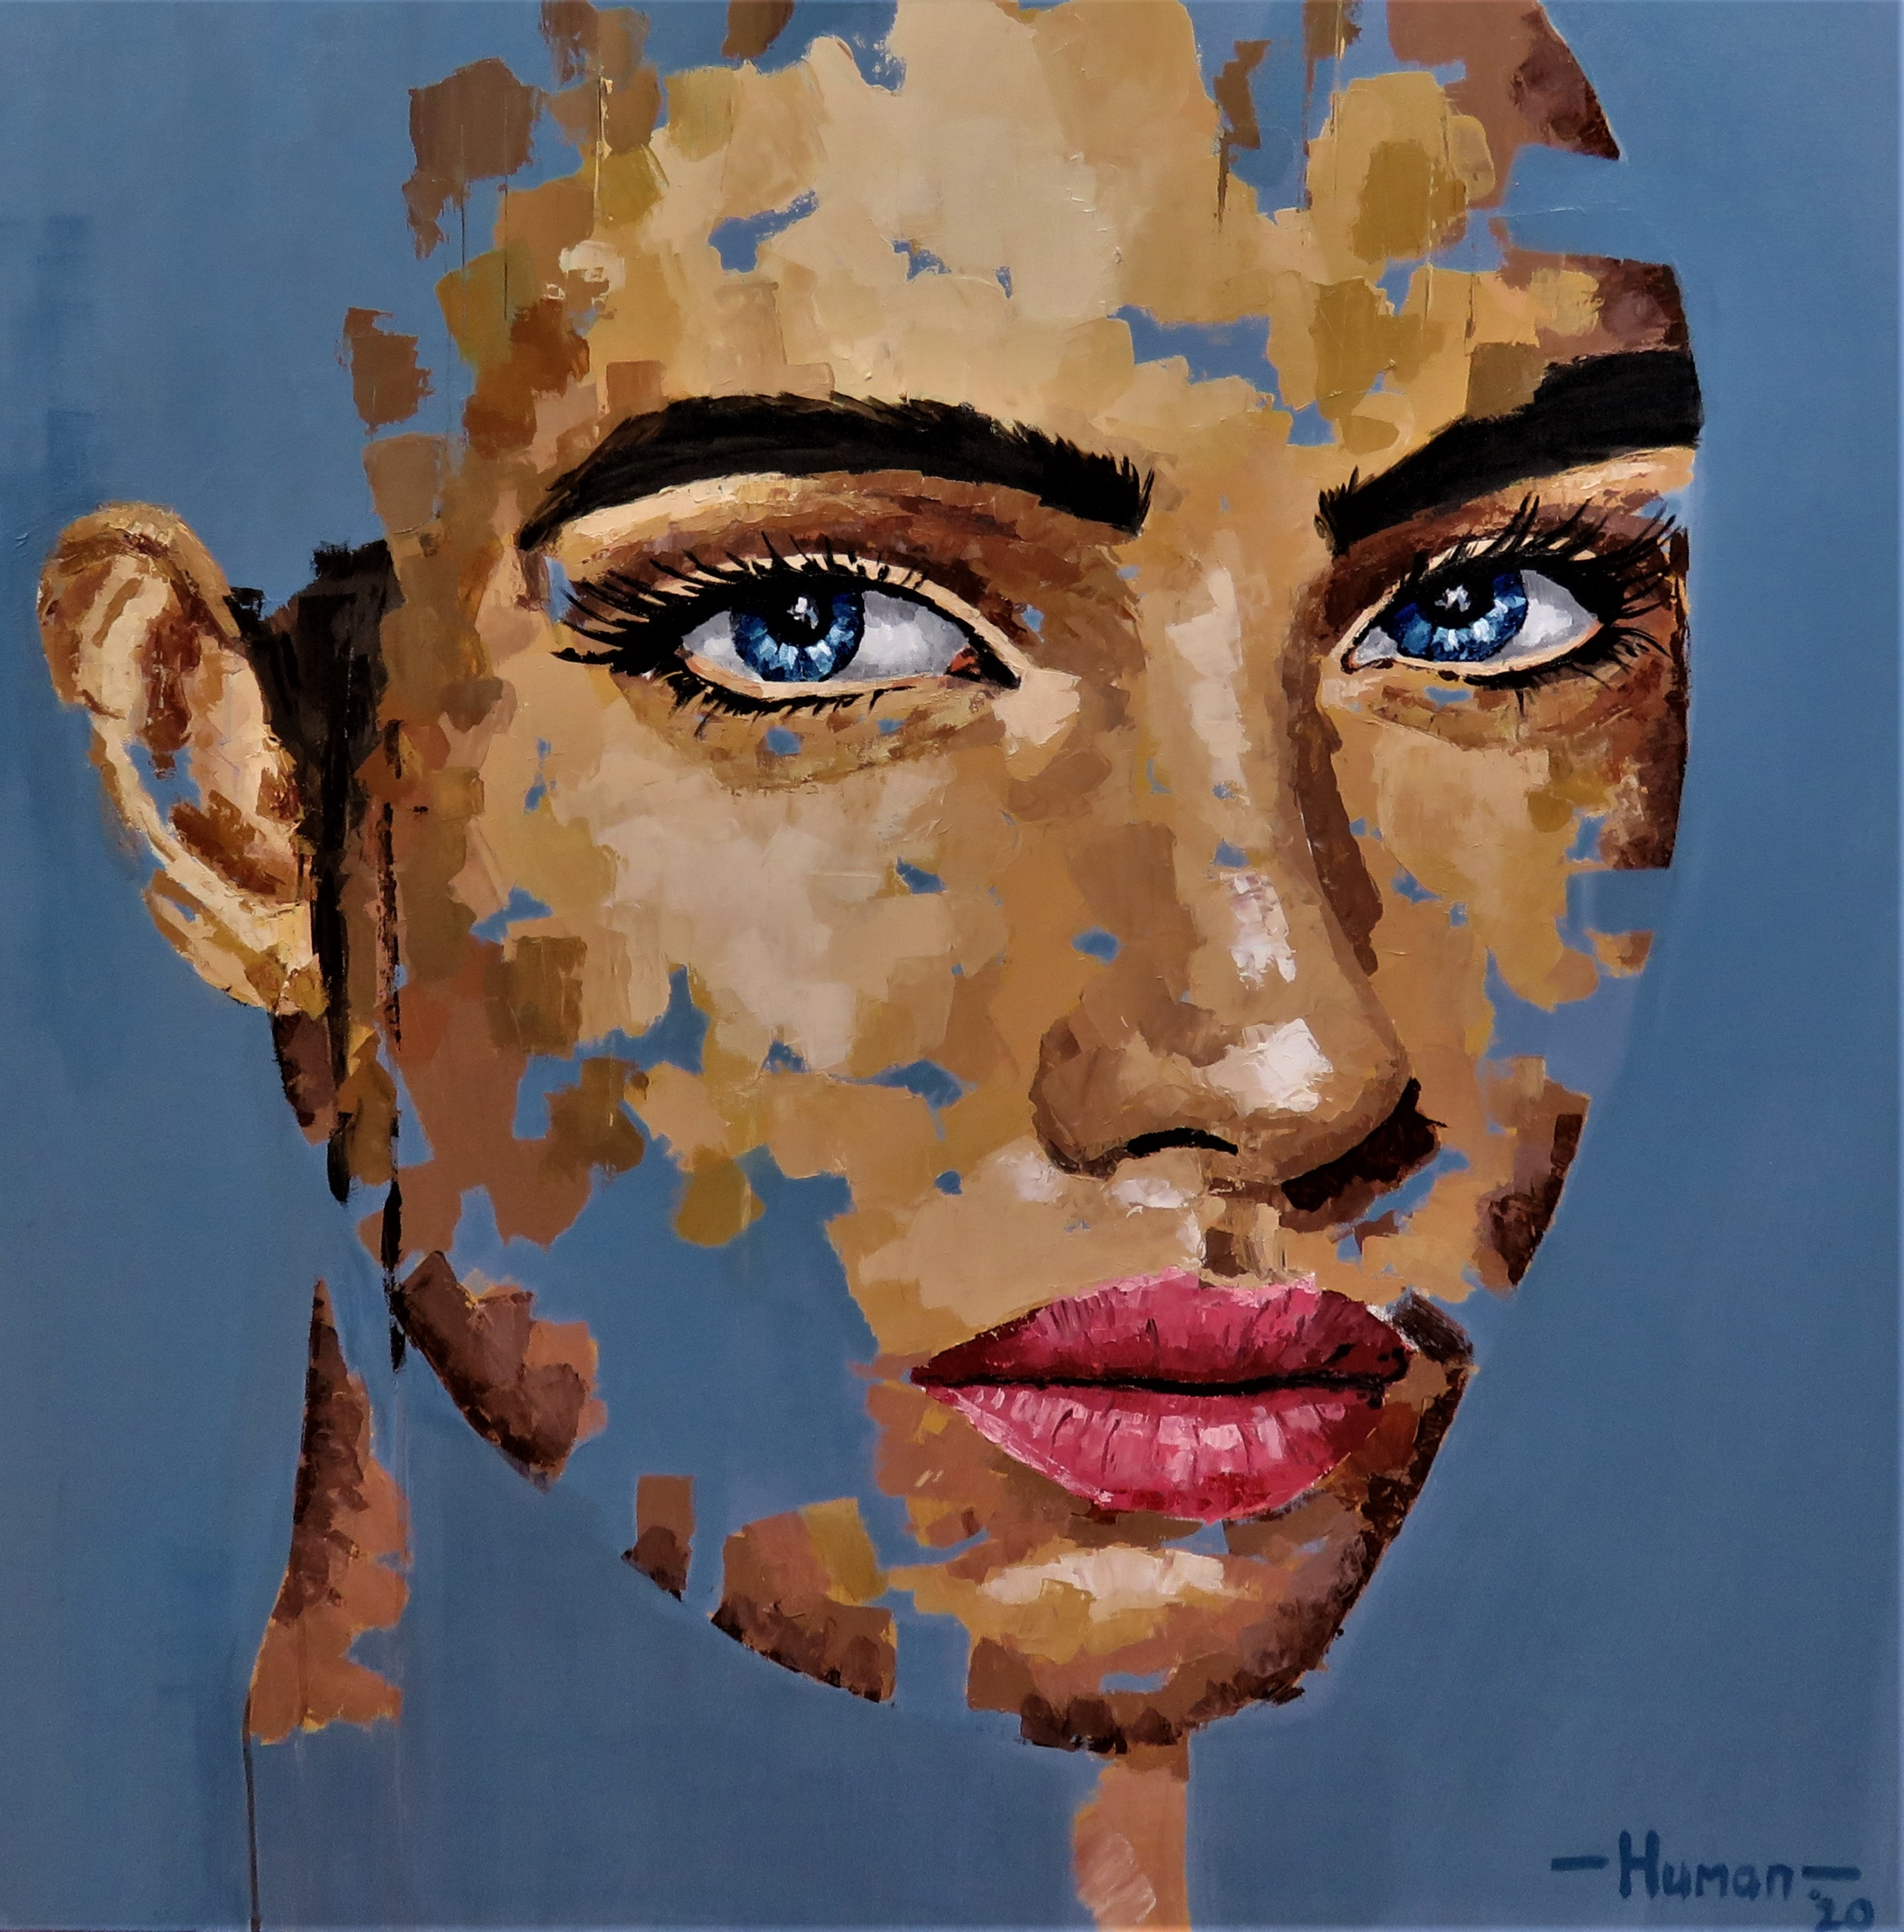 coenrad human, coenrad human art, coenrad human for sale, coenrad human acrylic, for sale, crouse art gallery, art gallery